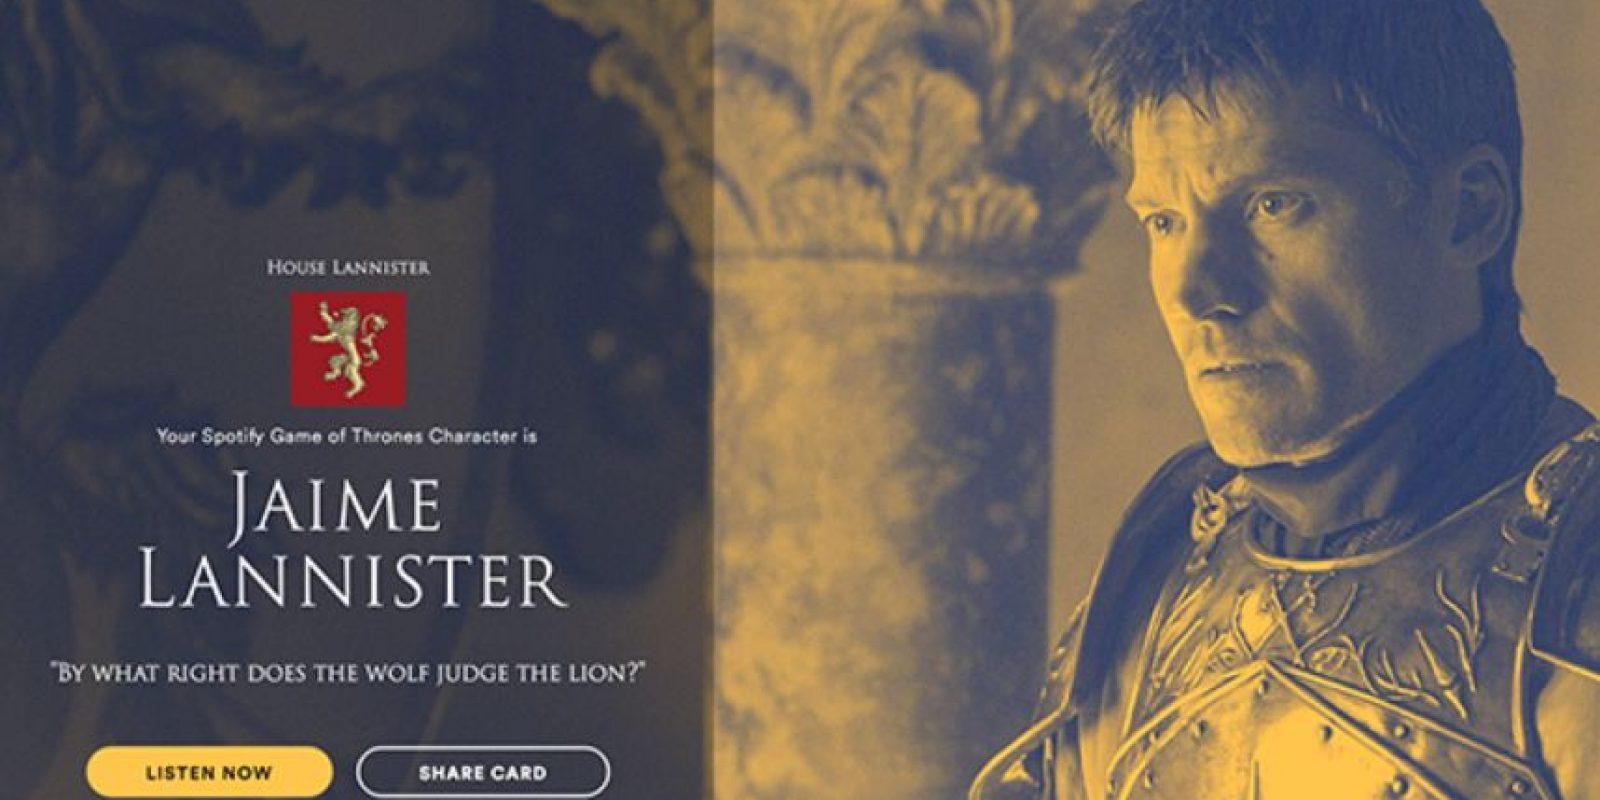 Personaje: Jaime Lannister. Foto:Spotify. Imagen Por: